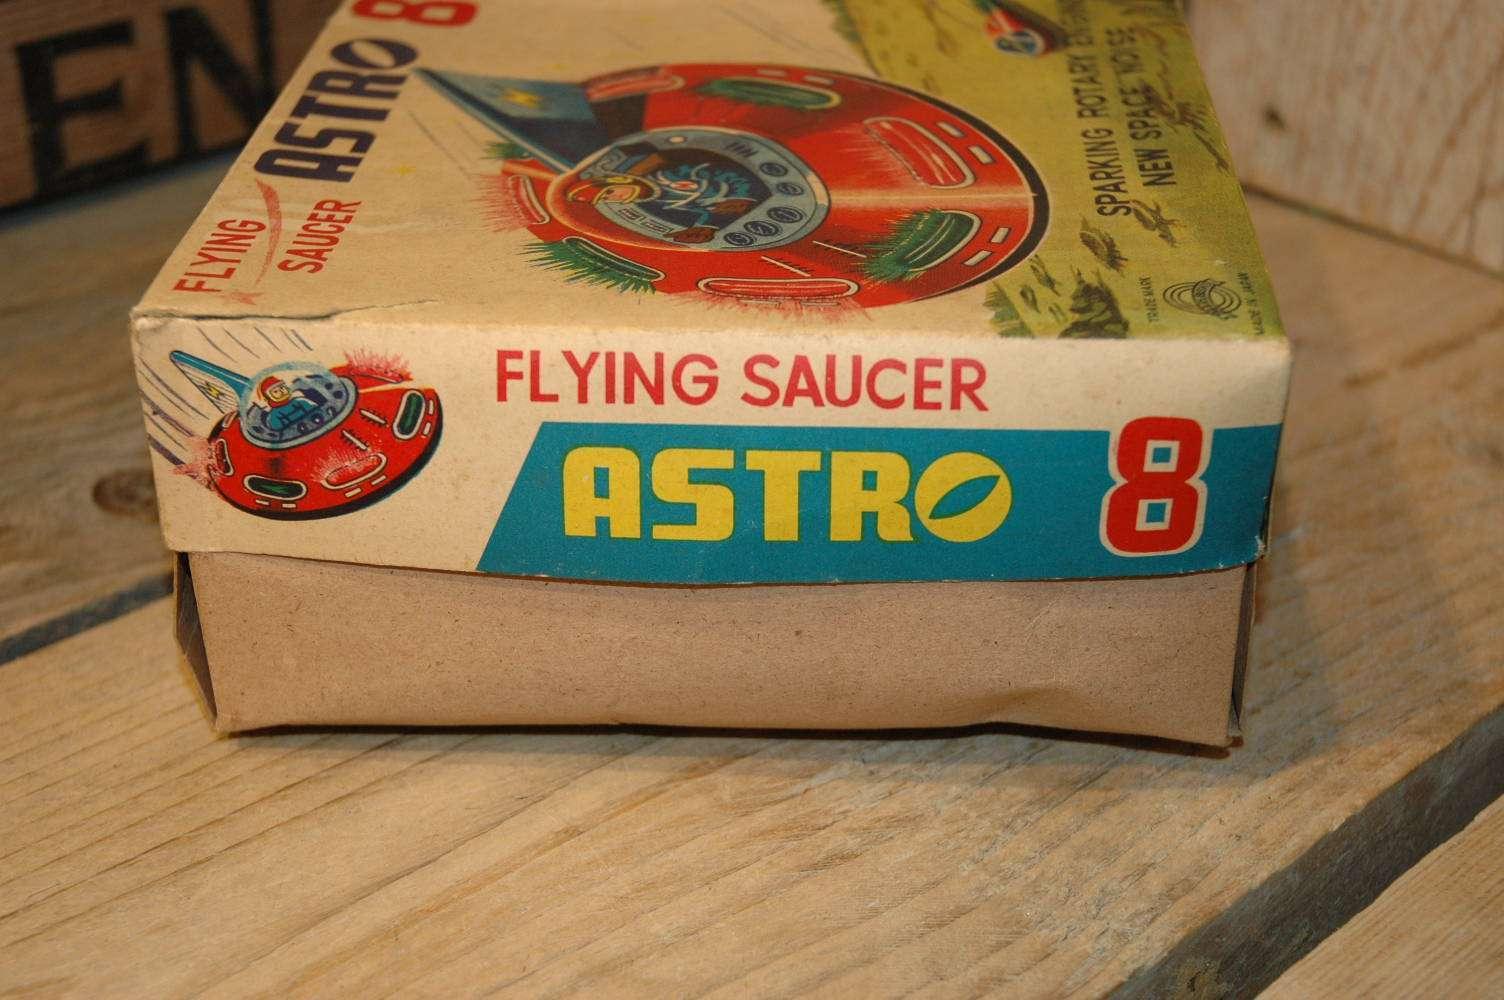 Marubishi - Astro 8 Flying Saucer